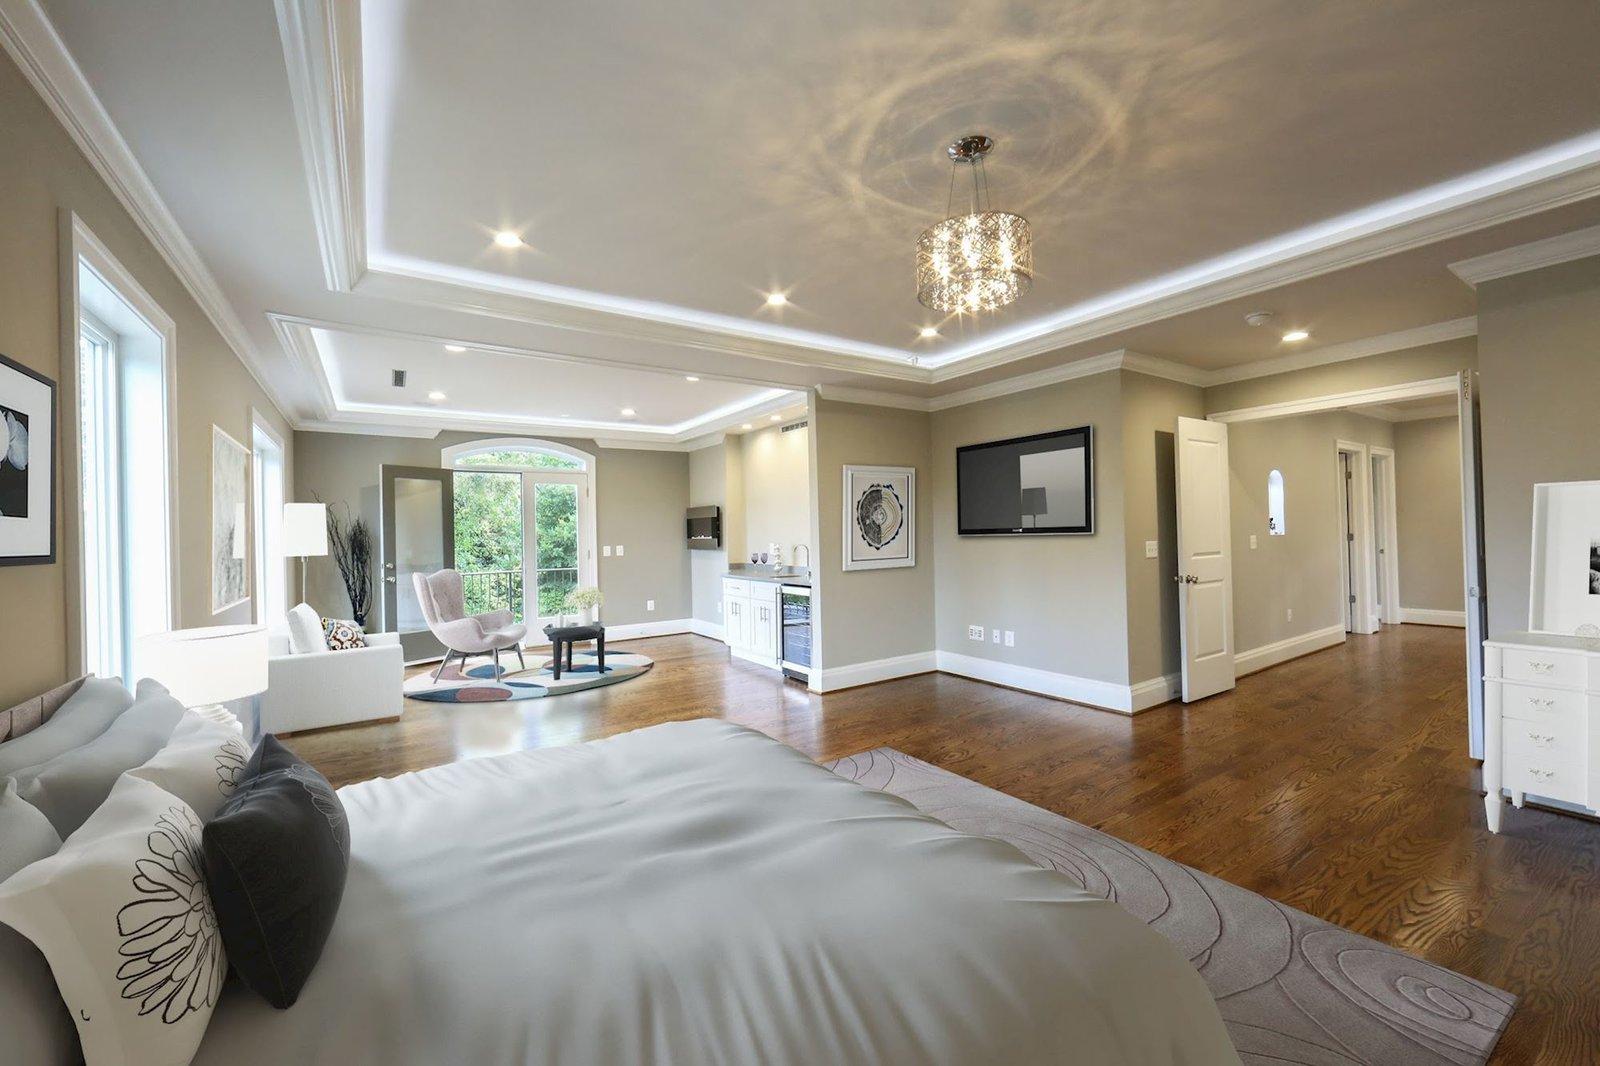 NEW International Stone & Stucco FOUR level newly built manor on Historic Arlington Ridge Road by Ikon Realty